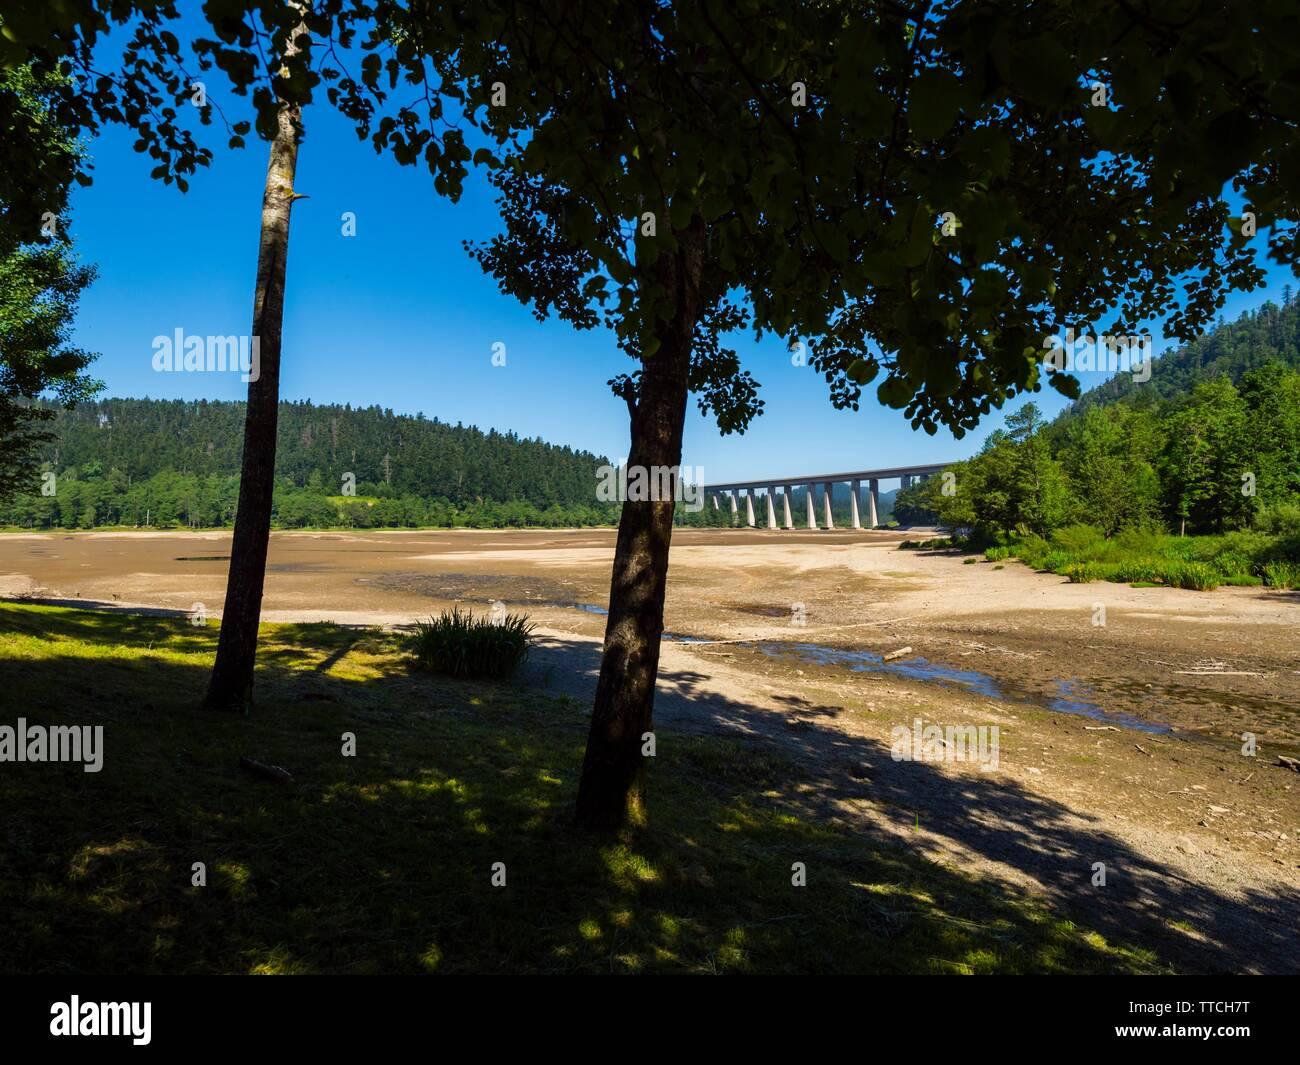 Dried lake-bed Bajer in Fuzine Croatia Spring 2019 highway bridge in background Stock Photo